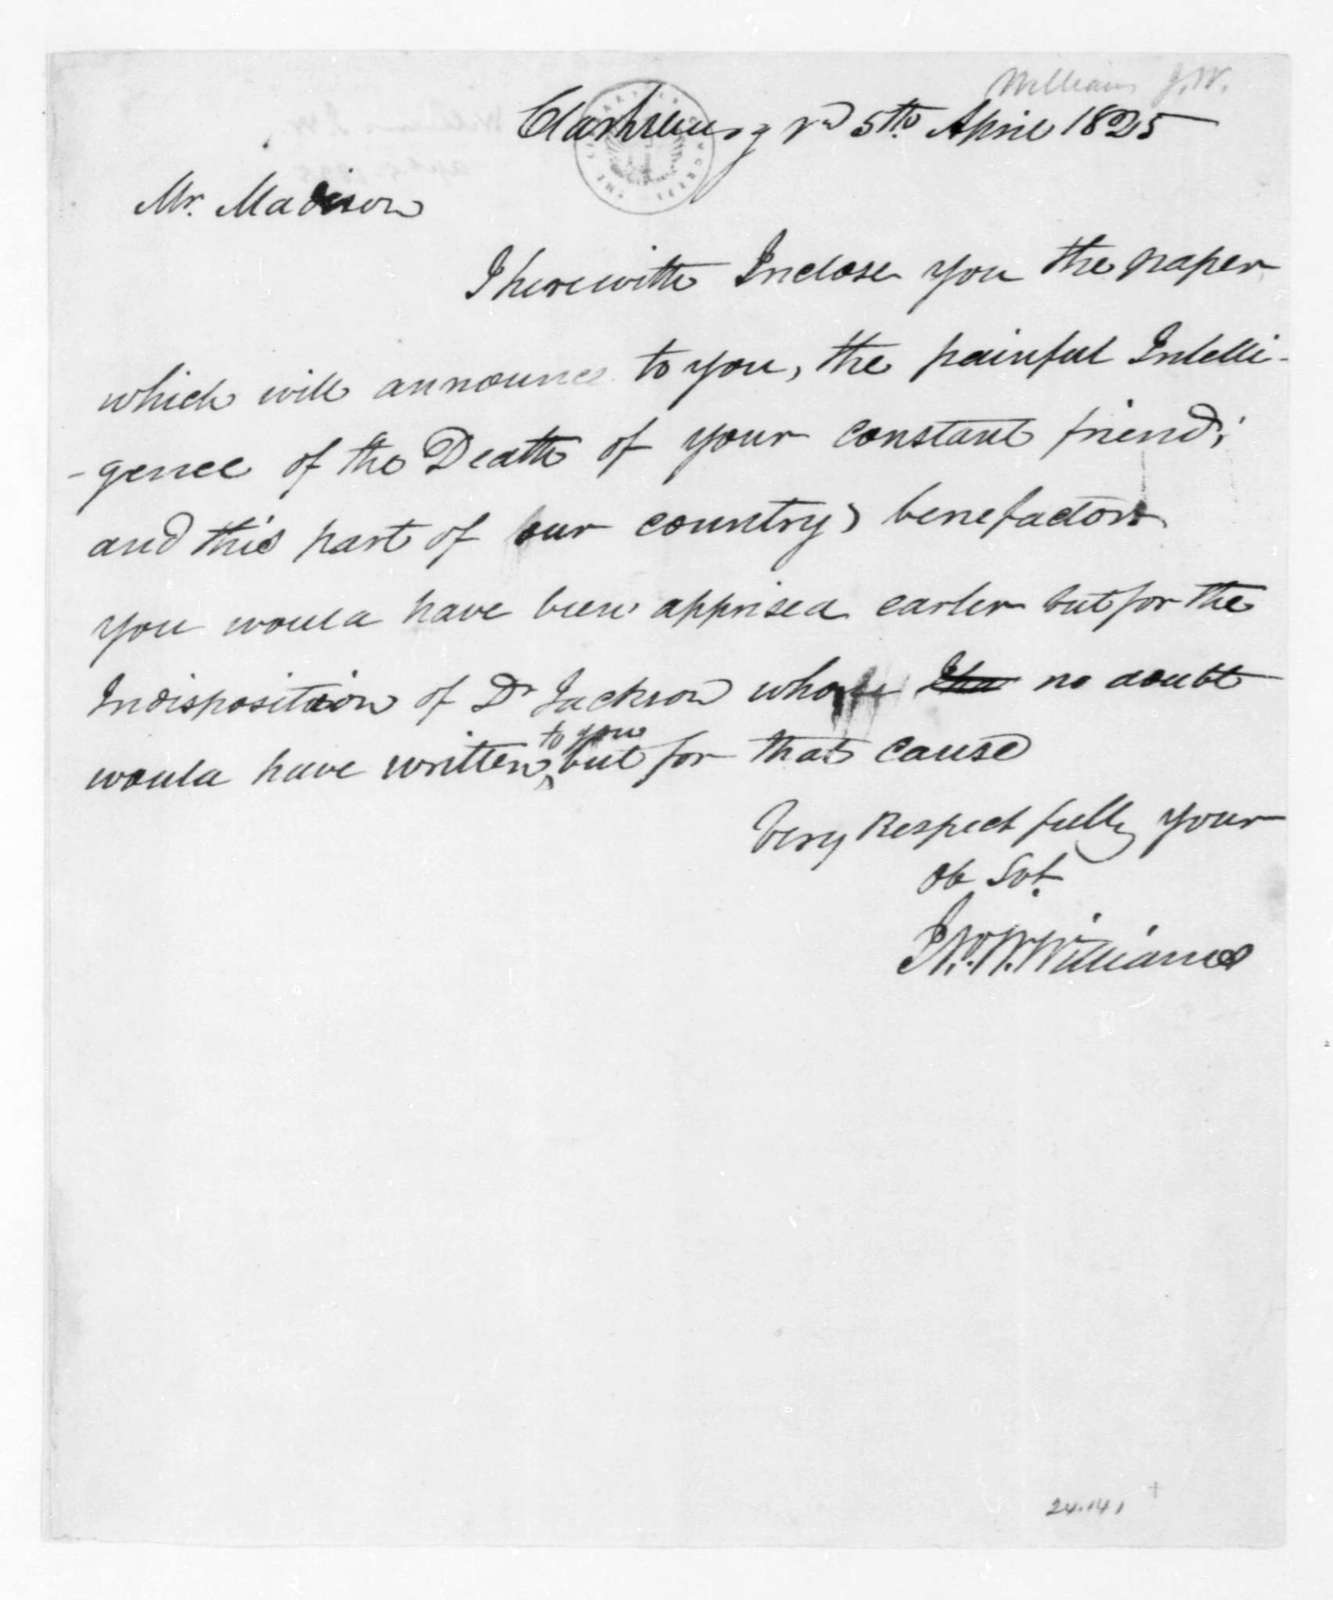 J. W. Williams to James Madison, April 5, 1825.